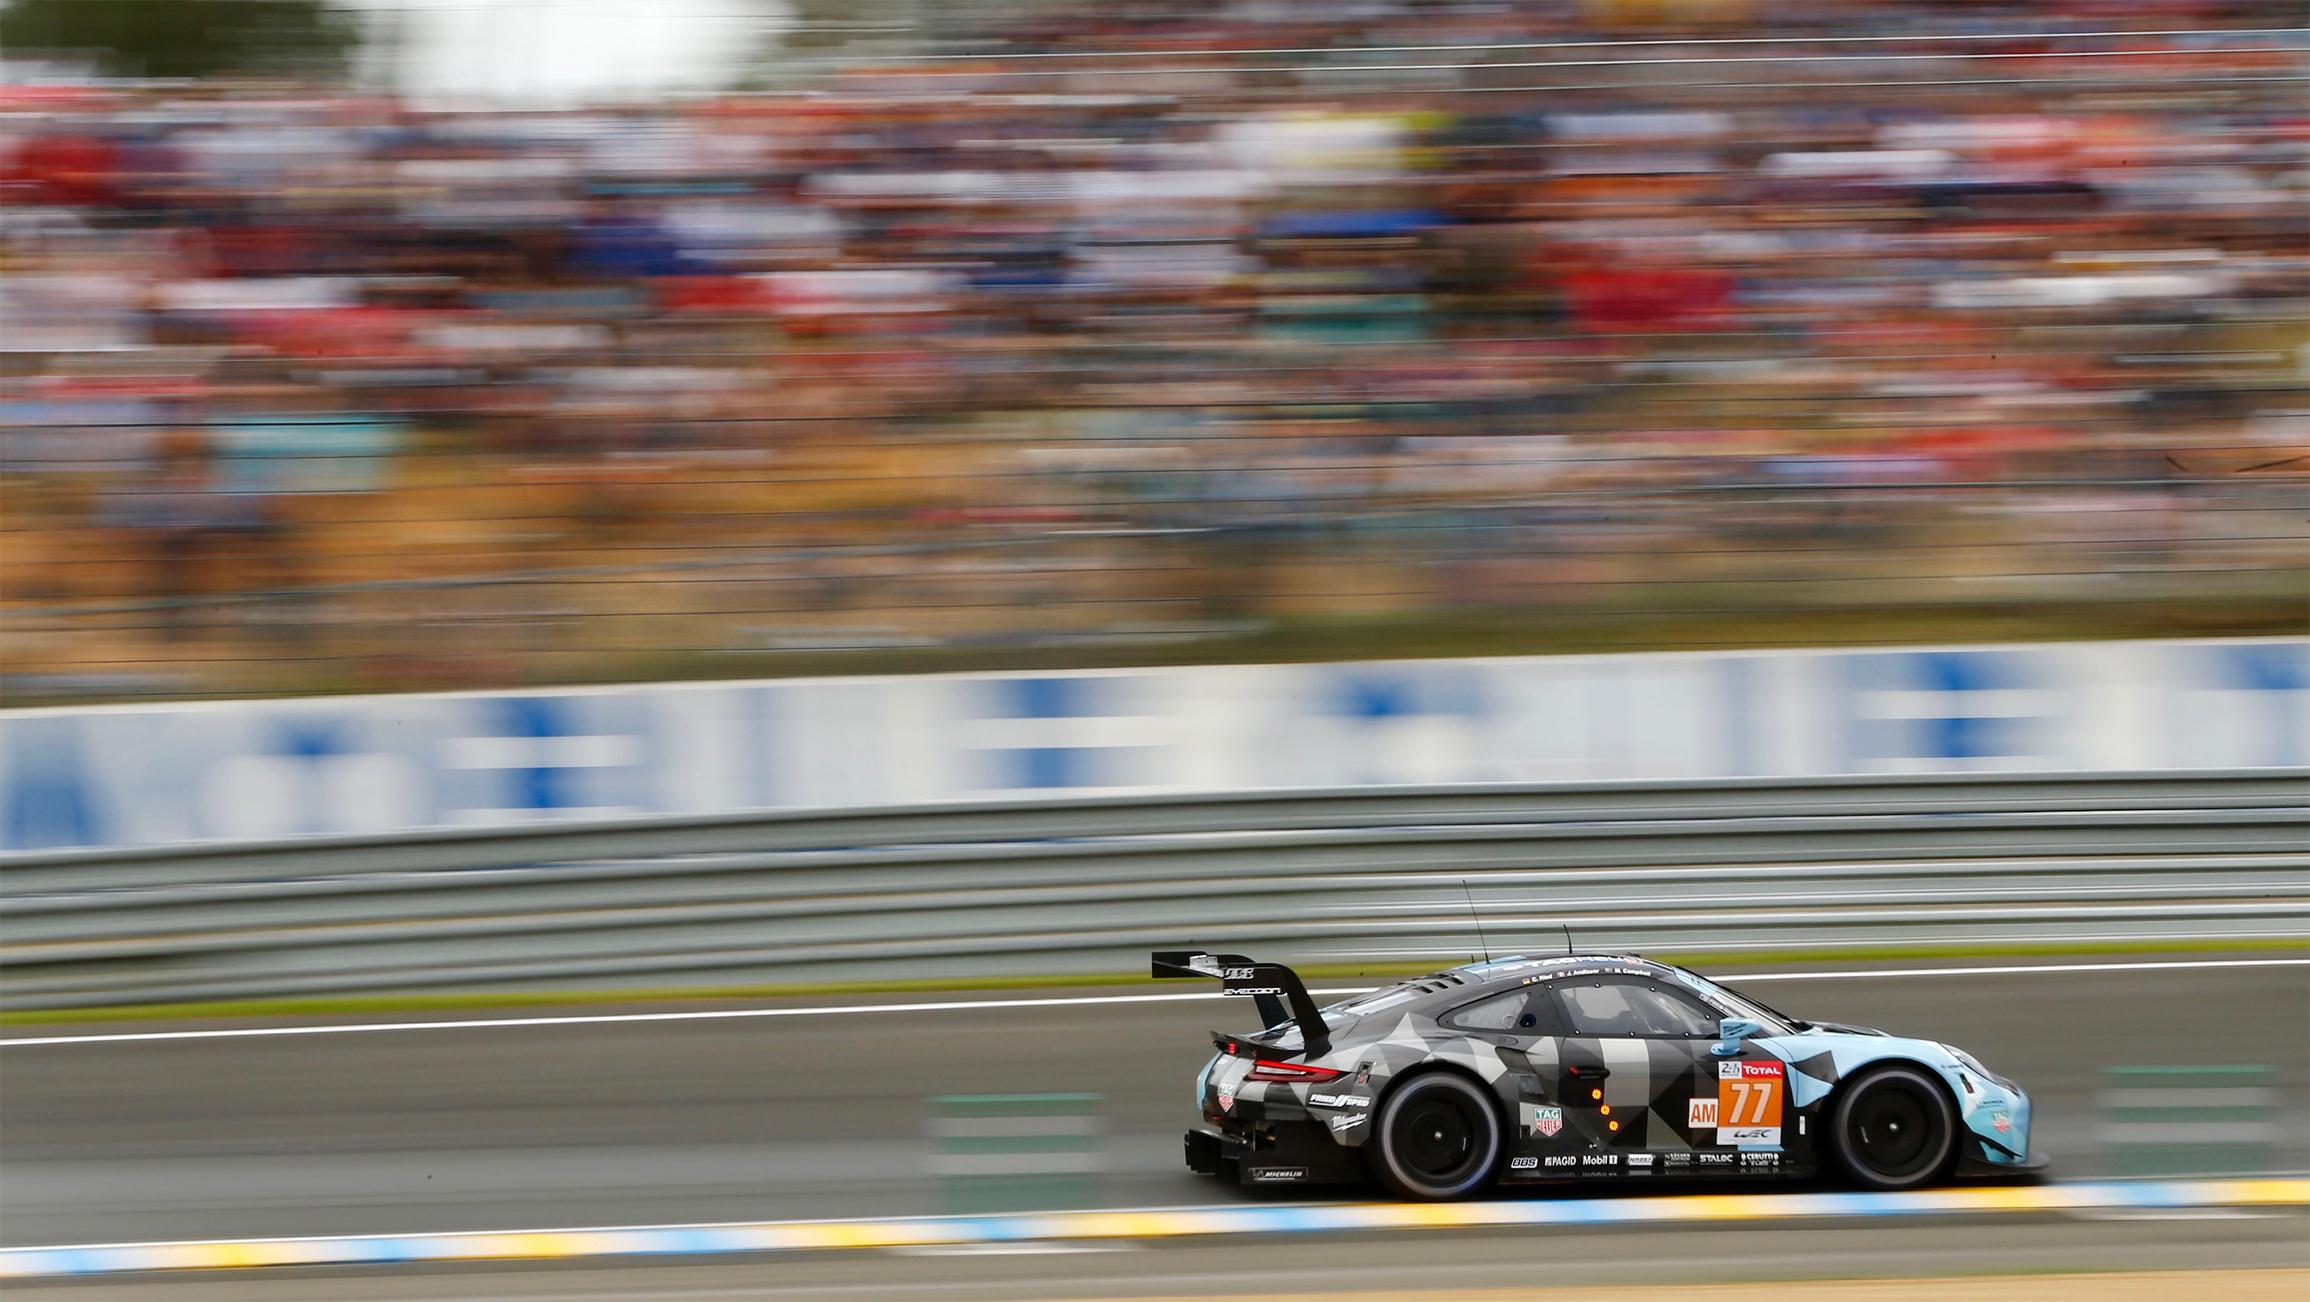 TrackWorthy - No. 77 Porsche 911 RSR